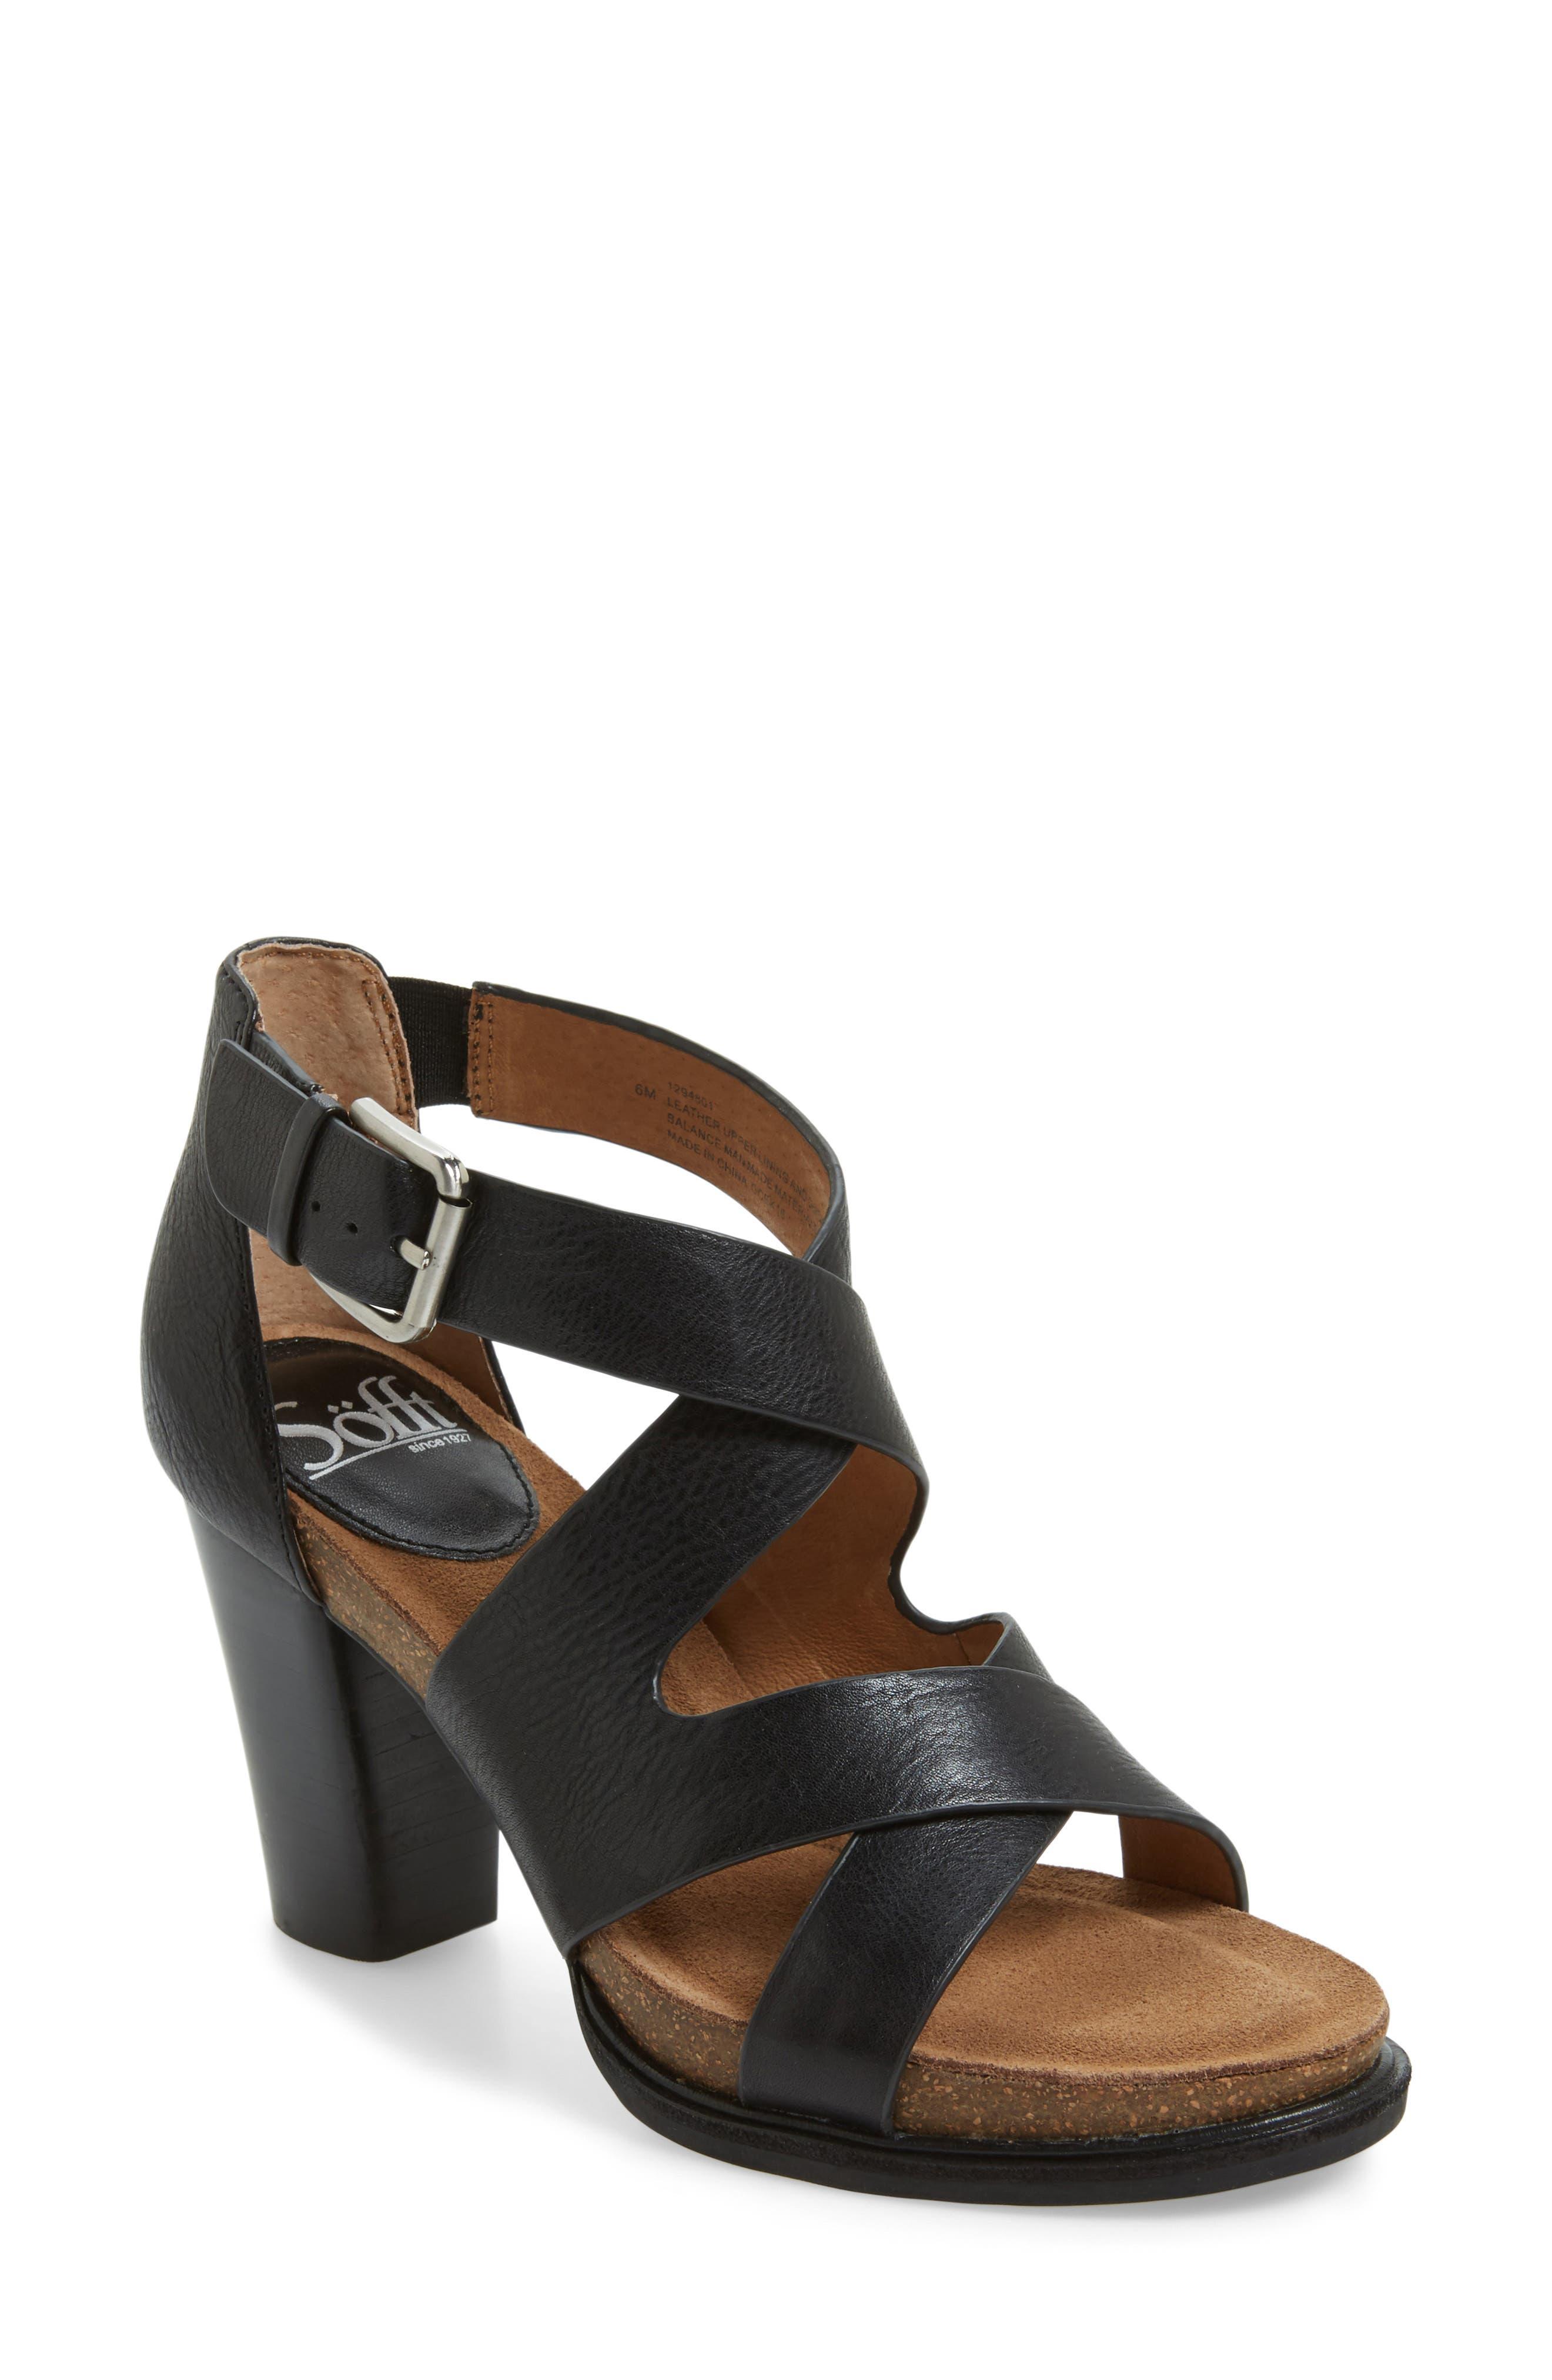 Canita Block Heel Sandal,                             Main thumbnail 1, color,                             001